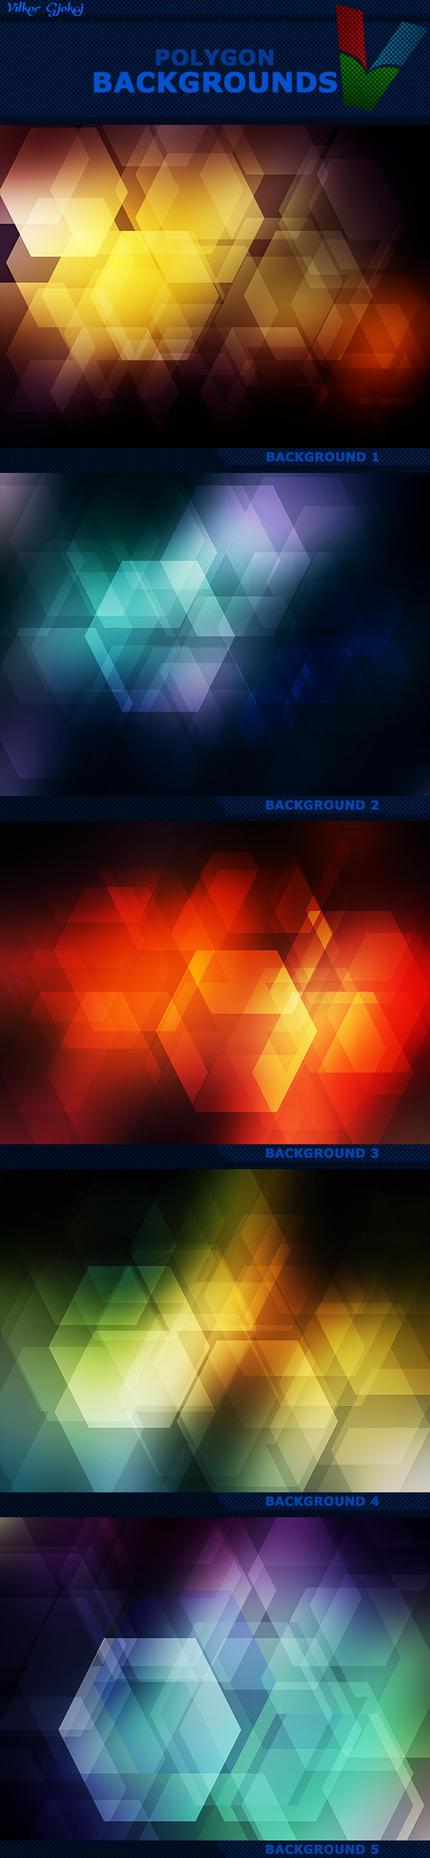 Polygon Photoshop Backgrounds by ViktorGjokaj